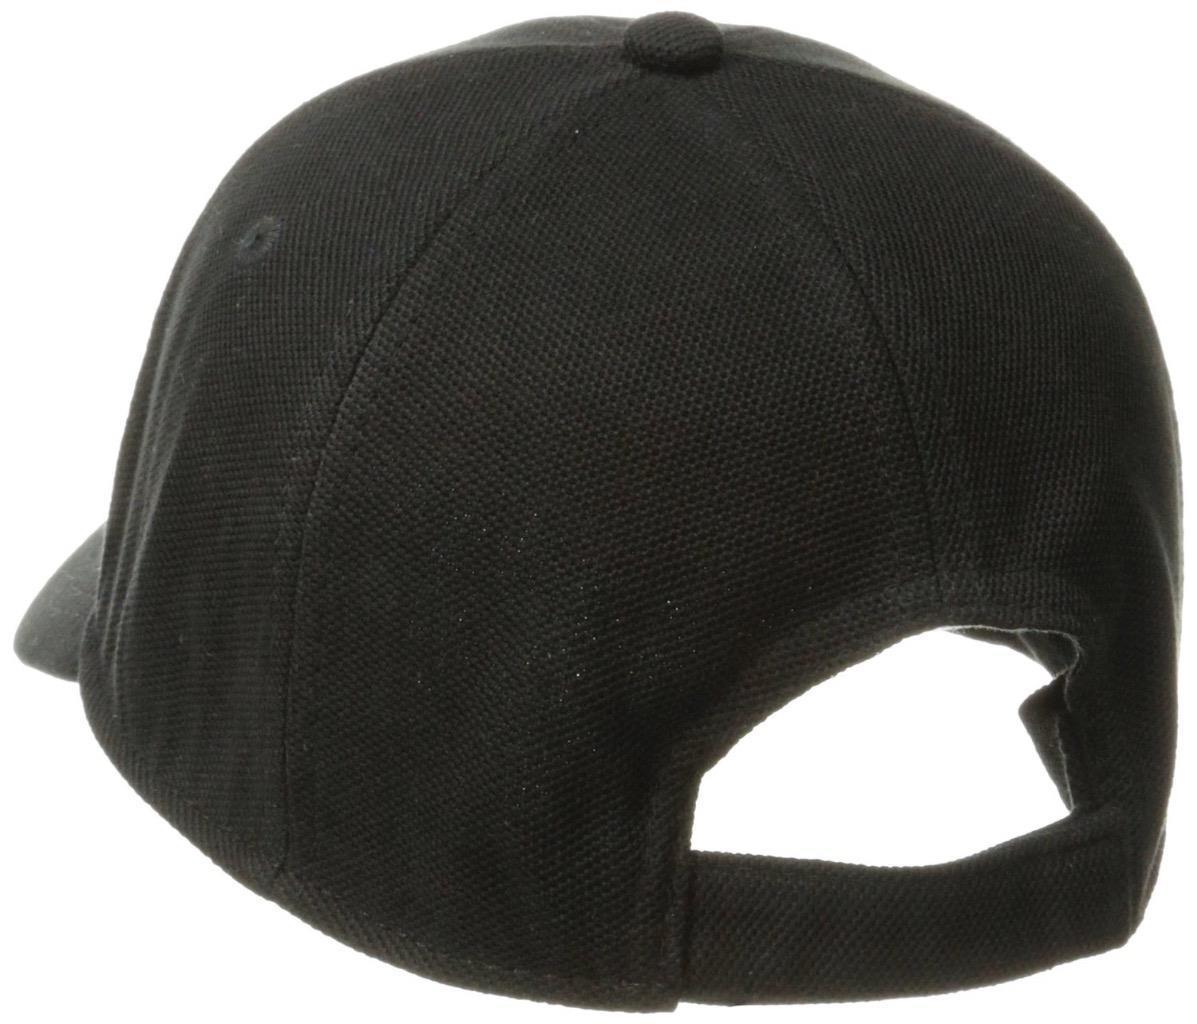 Lacoste Men/'s Classic Baseball Premium Cotton Pique Croc Logo Hat Cap RK0123-51